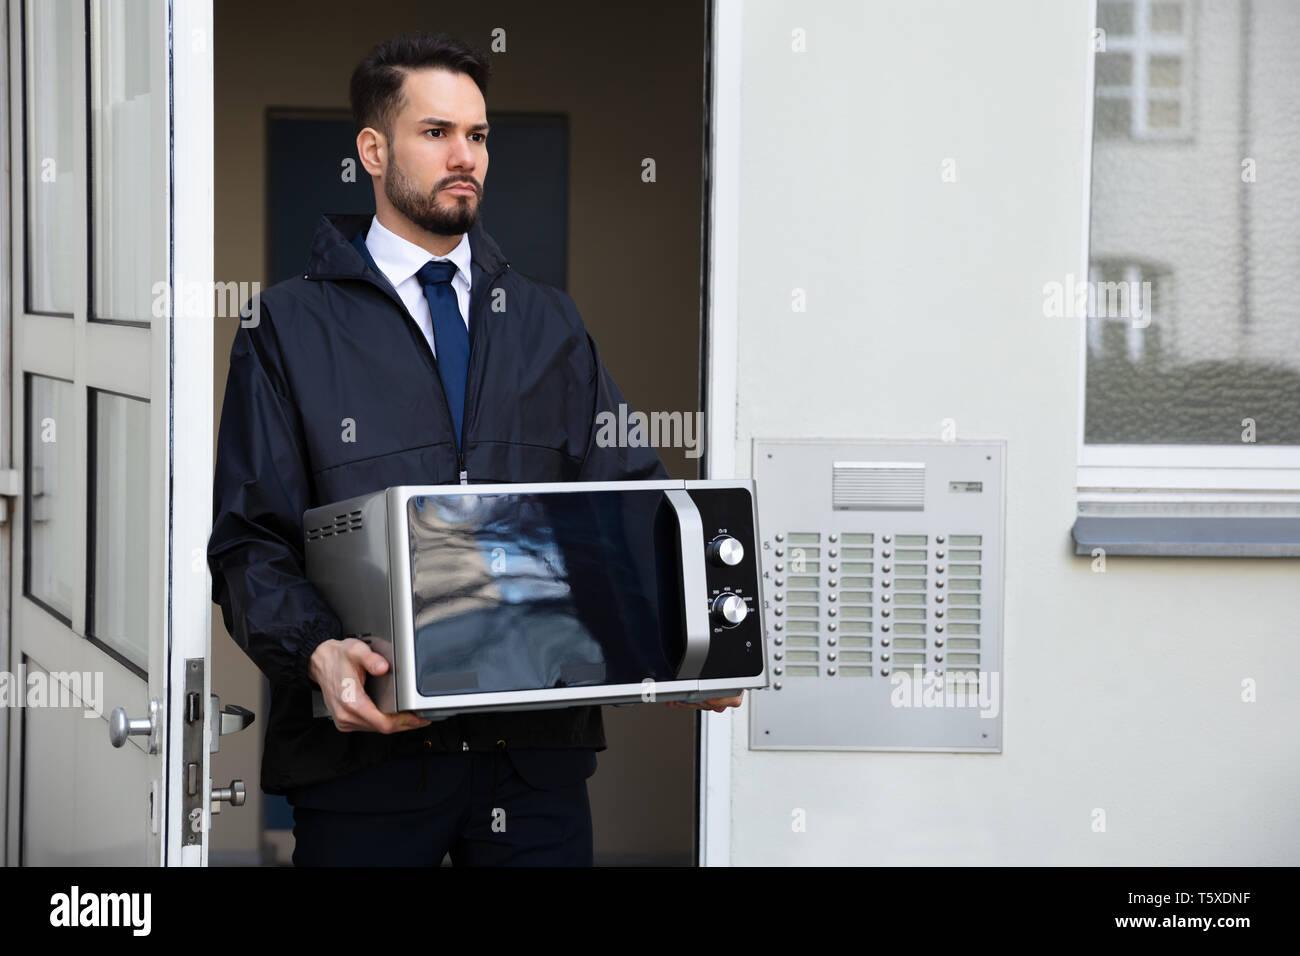 Male Technician Holding Microwave Standing Near Intercom - Stock Image